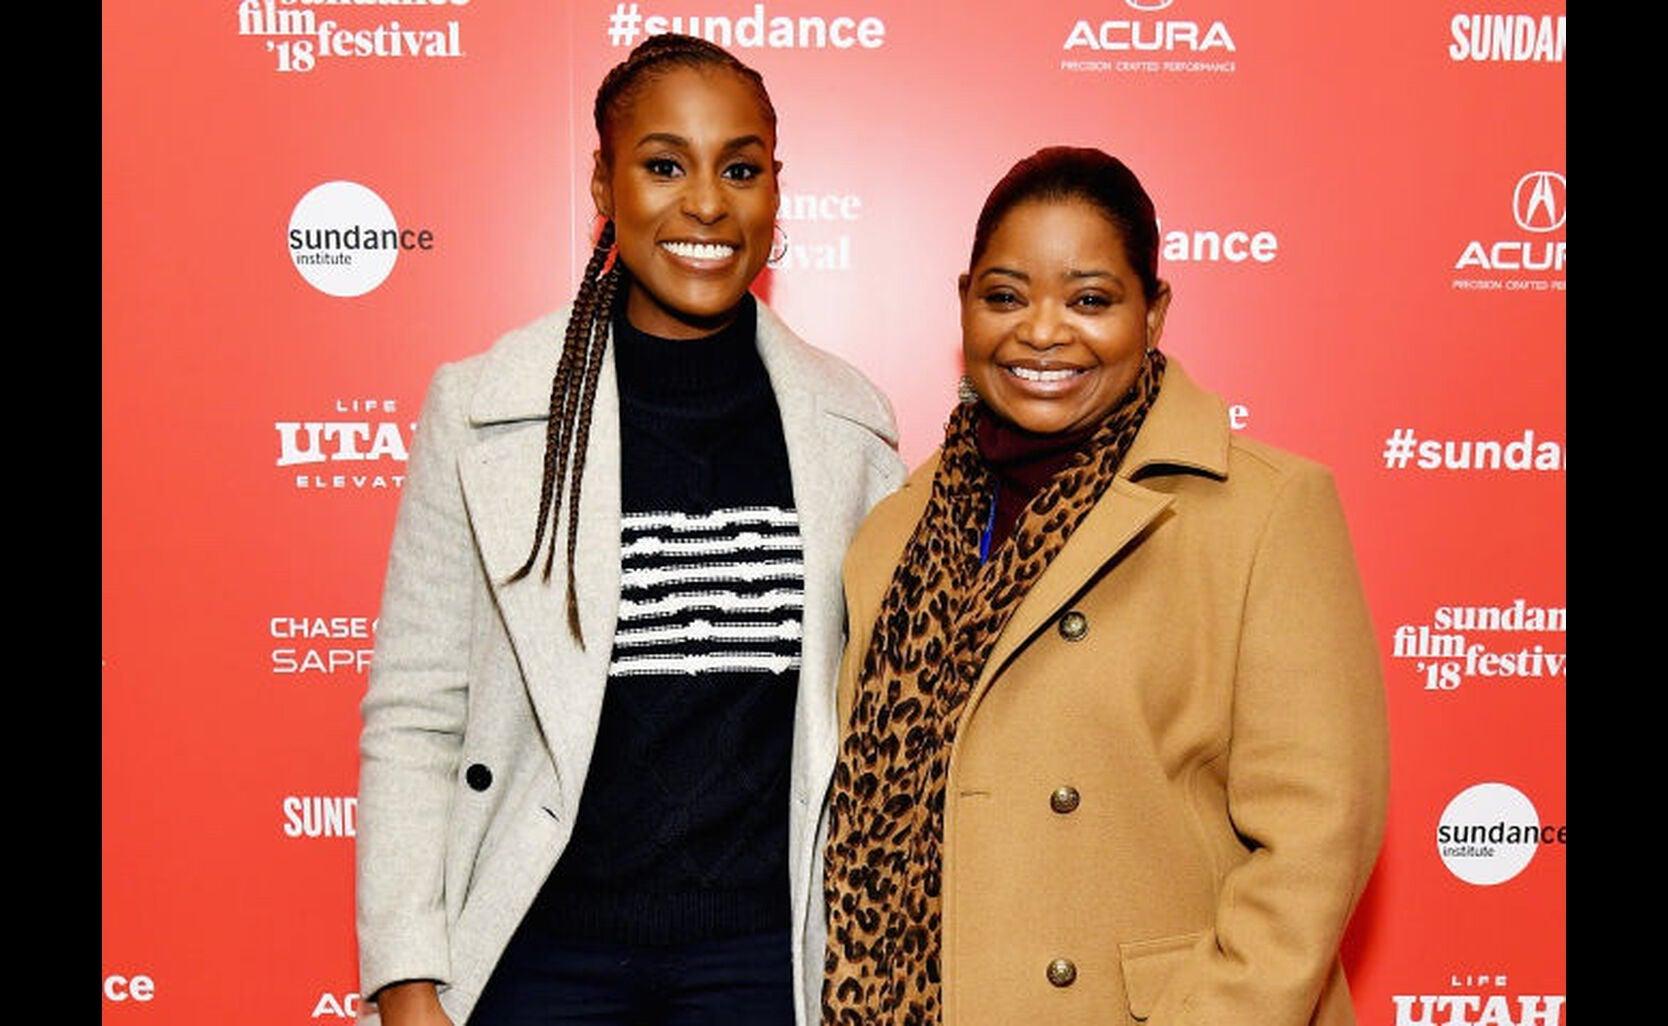 Issa Rae and Octavia Spencer in Sundance 2018